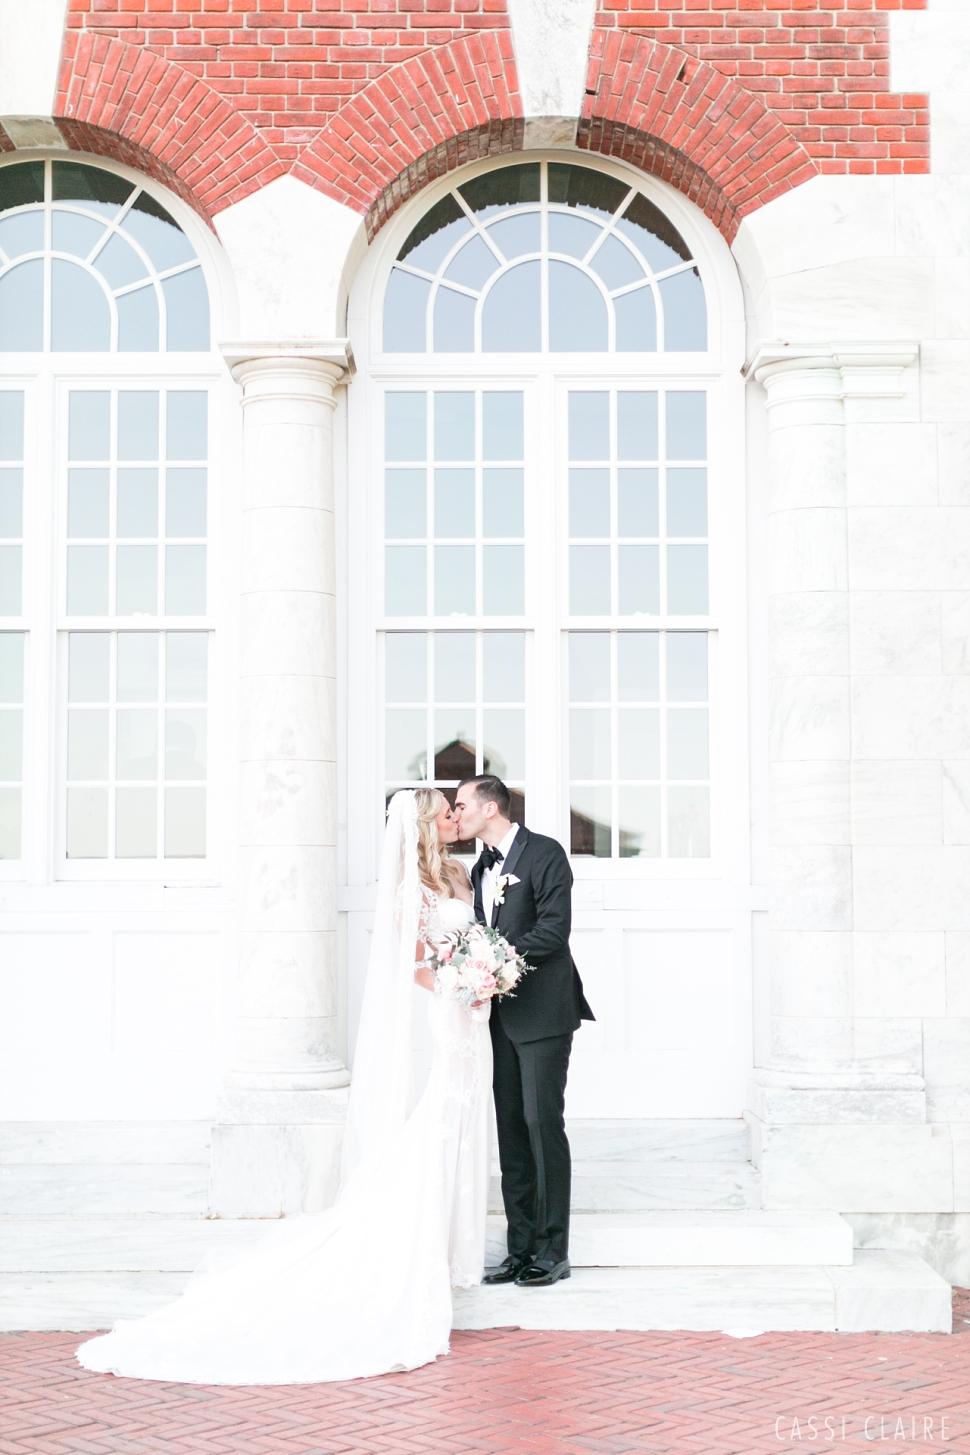 Bright-Happy-NJ-Wedding-Photographer-CassiClaire_24.jpg